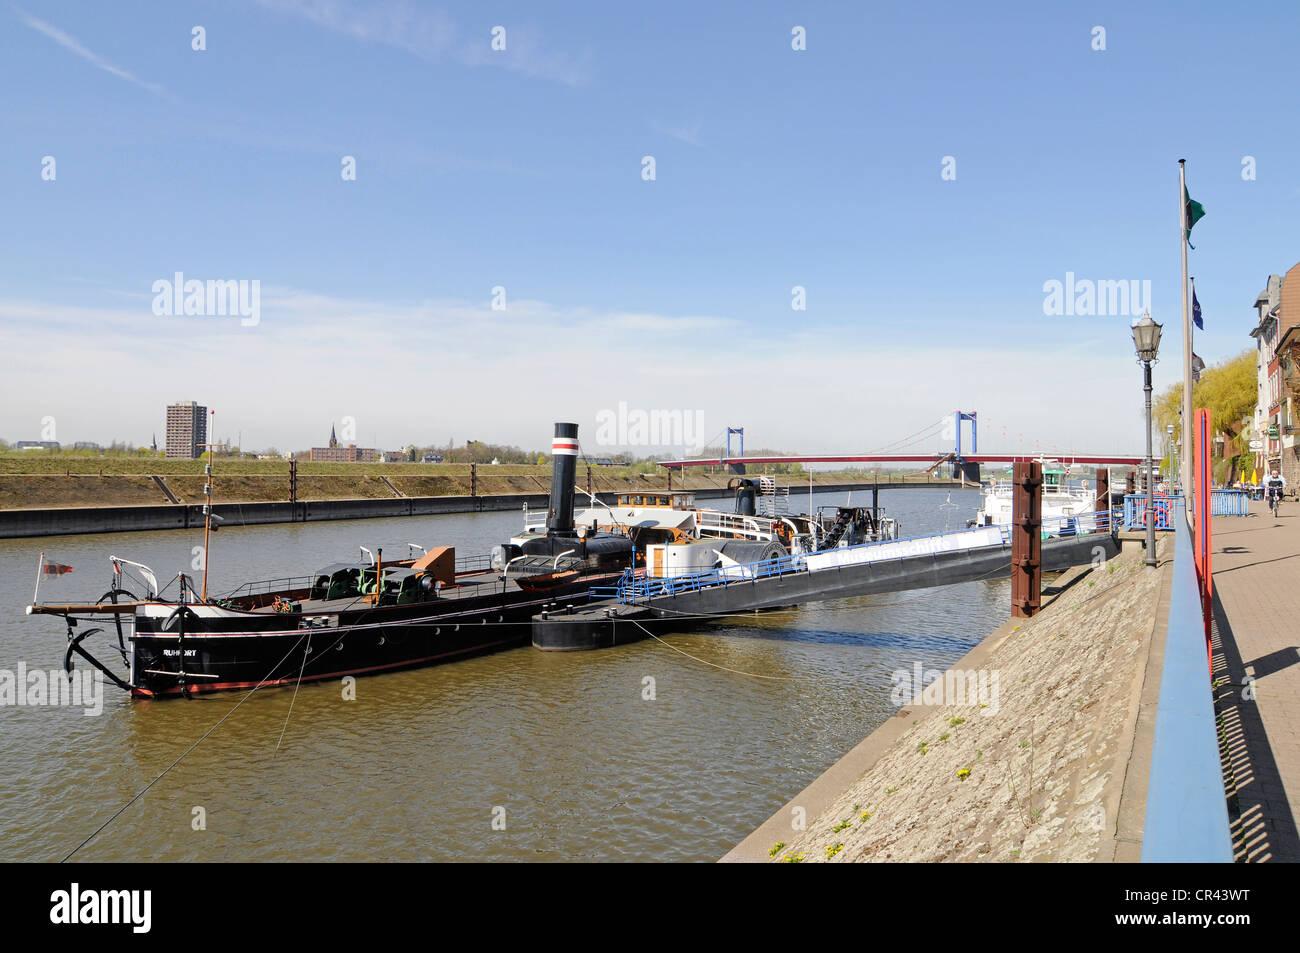 Museum ship, promenade, Museum of German inland shipping, harbour, Duisport, Duisburg, Ruhrgebiet region, North - Stock Image